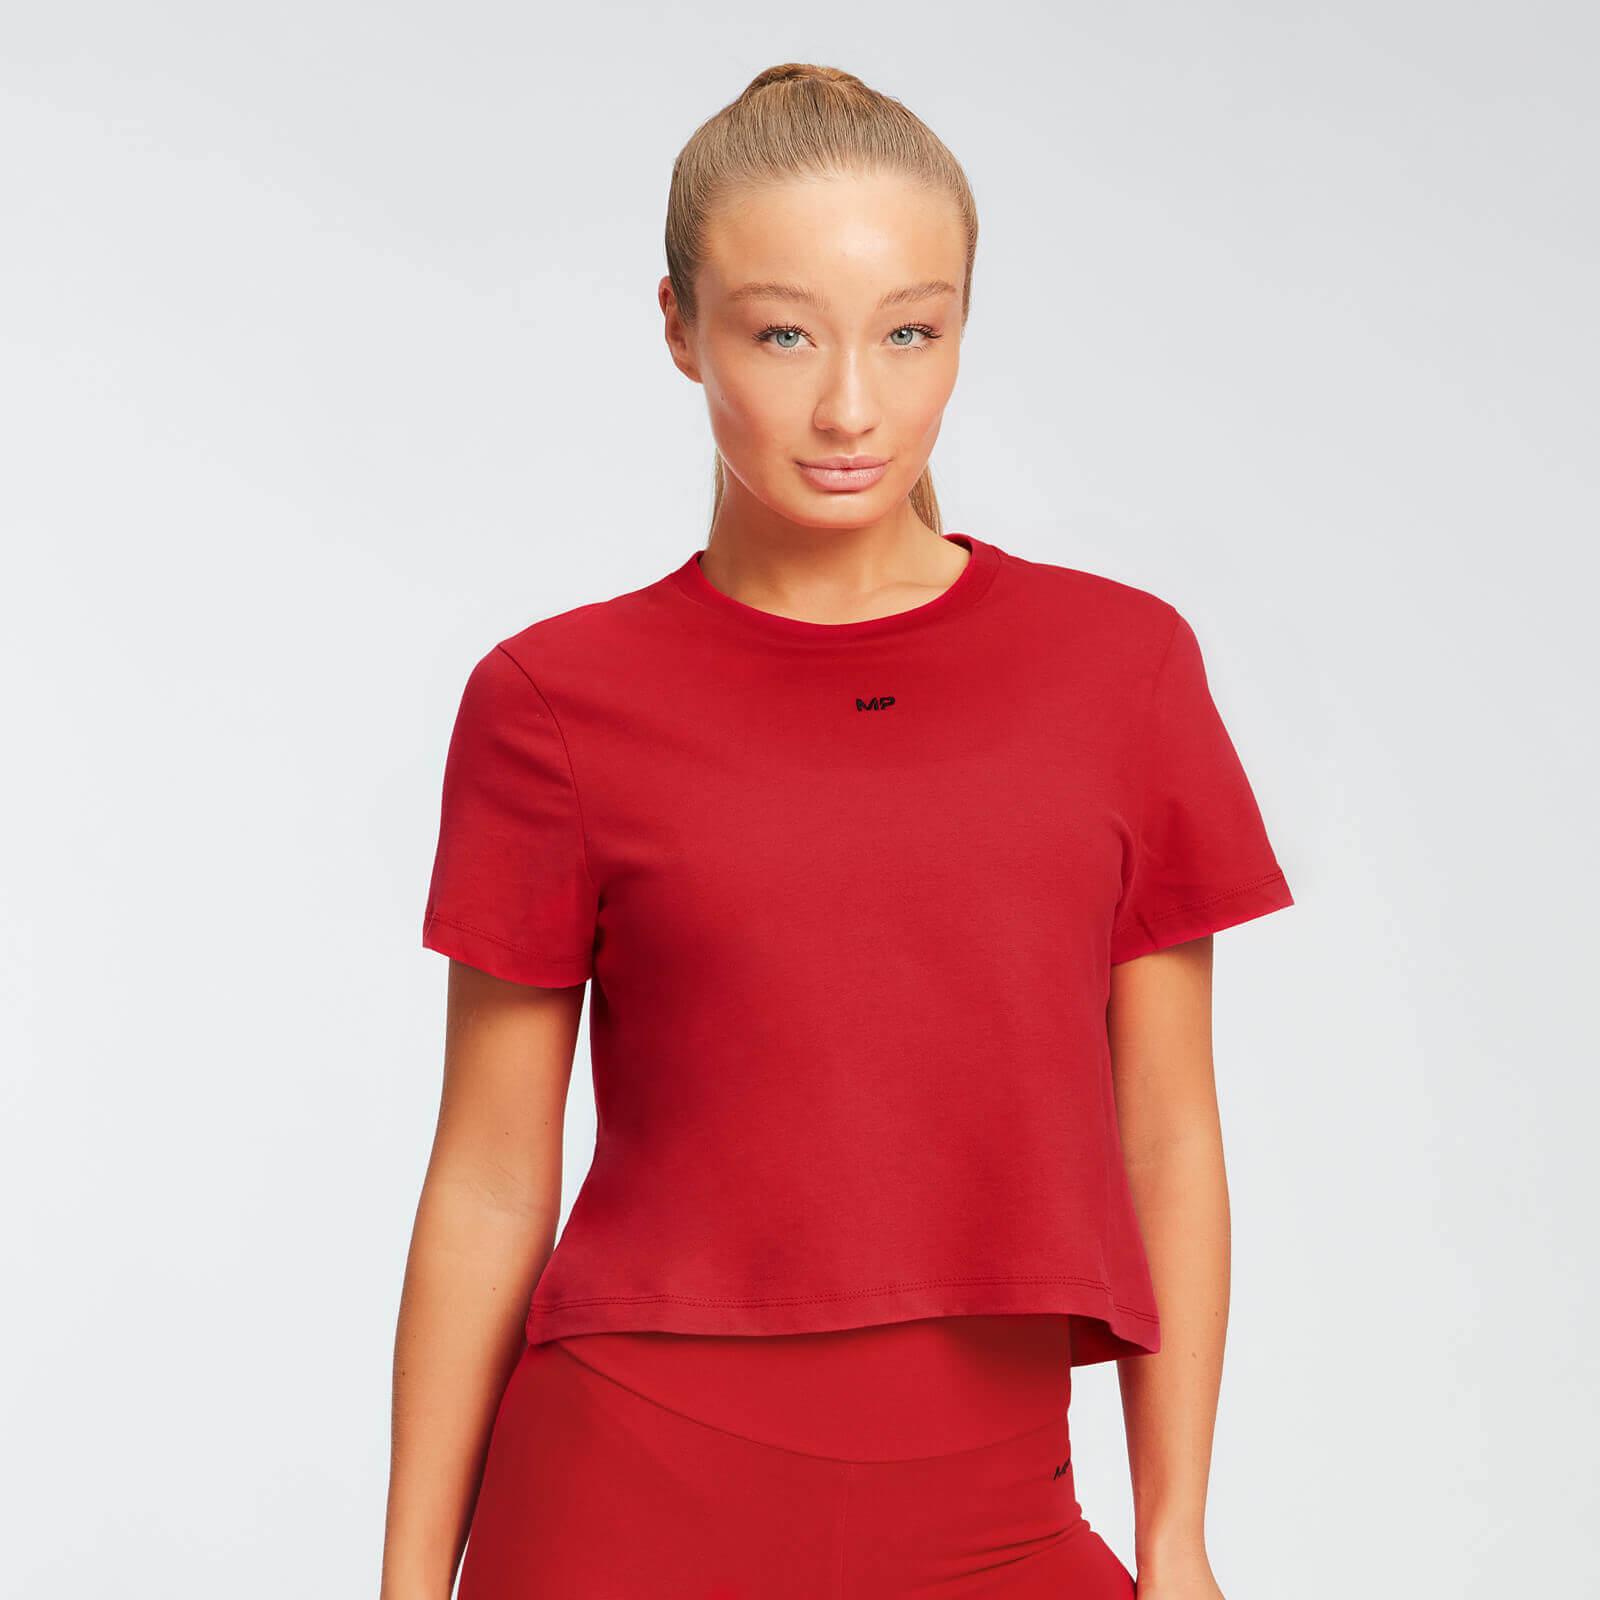 Купить Женская укороченная футболка MP Essentials - XXS, Myprotein International